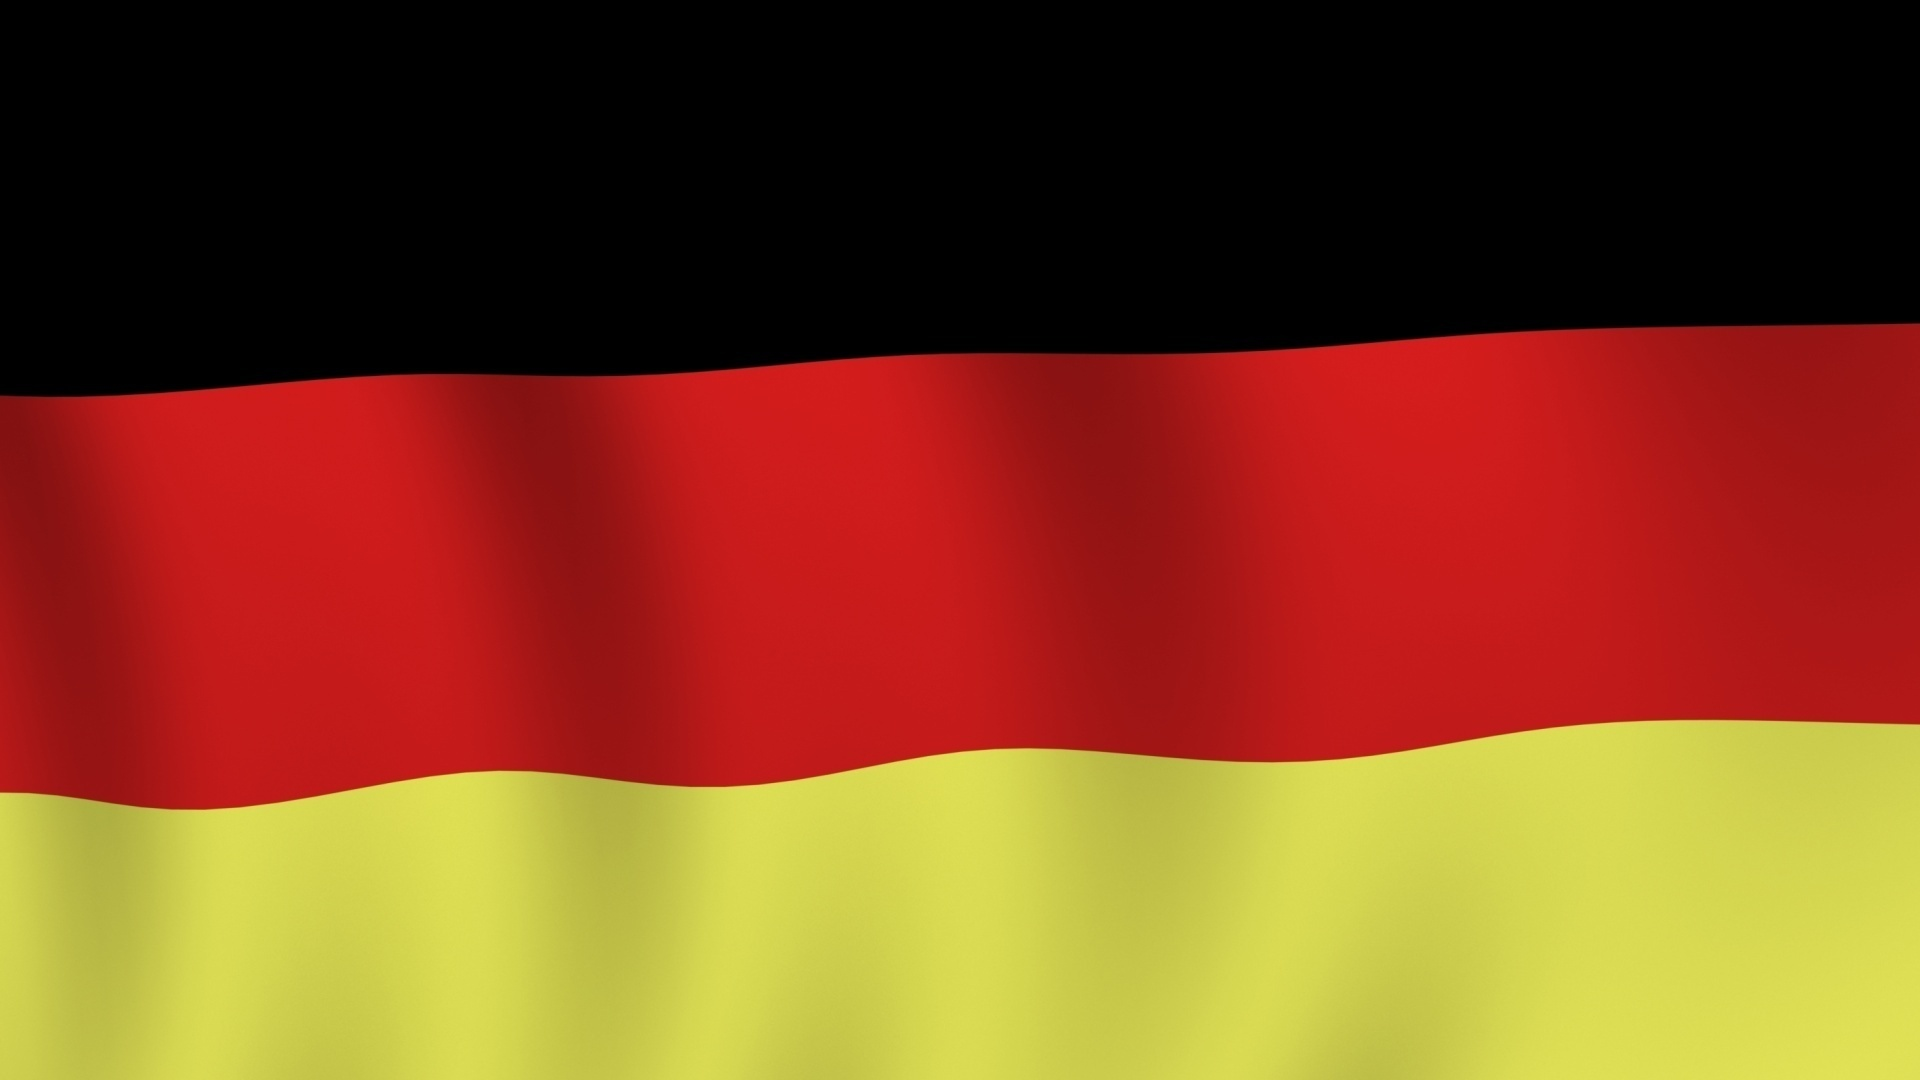 german flag wallpaper HD 1920x1080